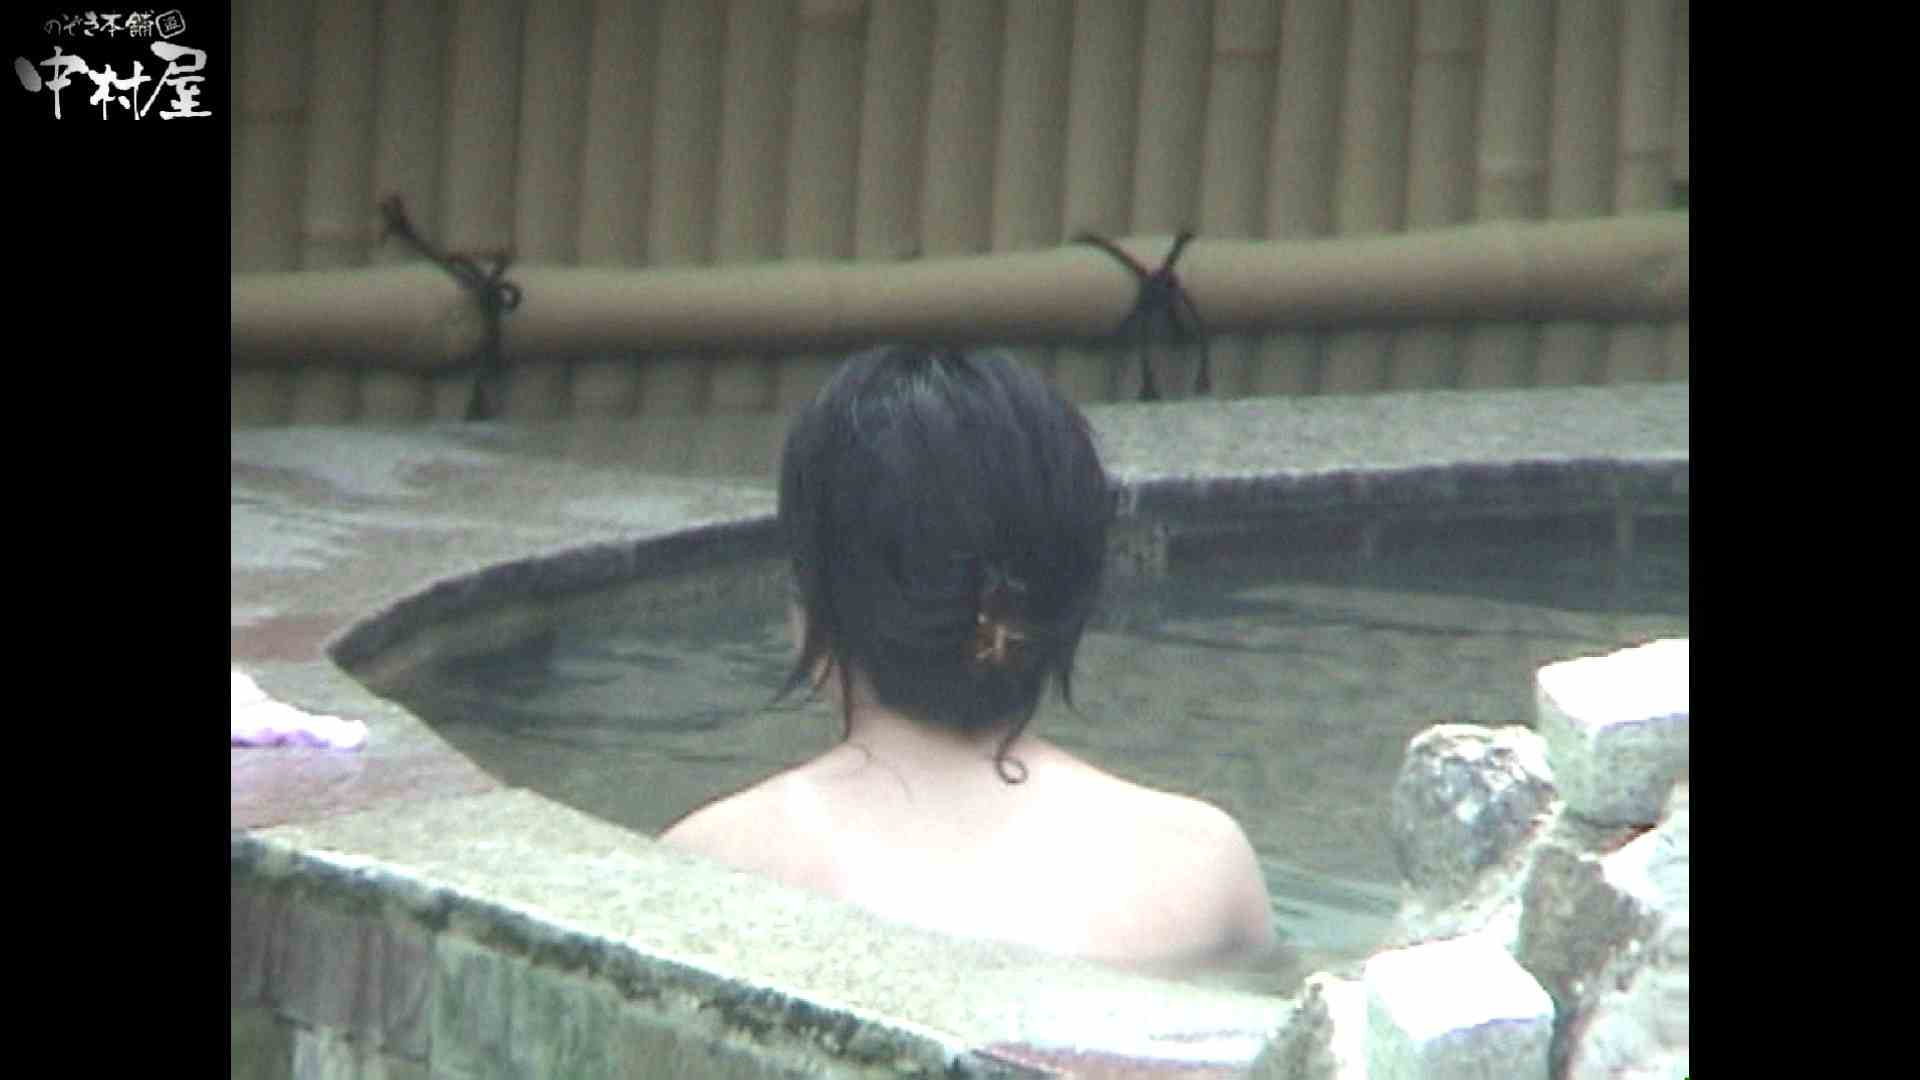 Aquaな露天風呂Vol.936 盗撮映像  110Pix 16